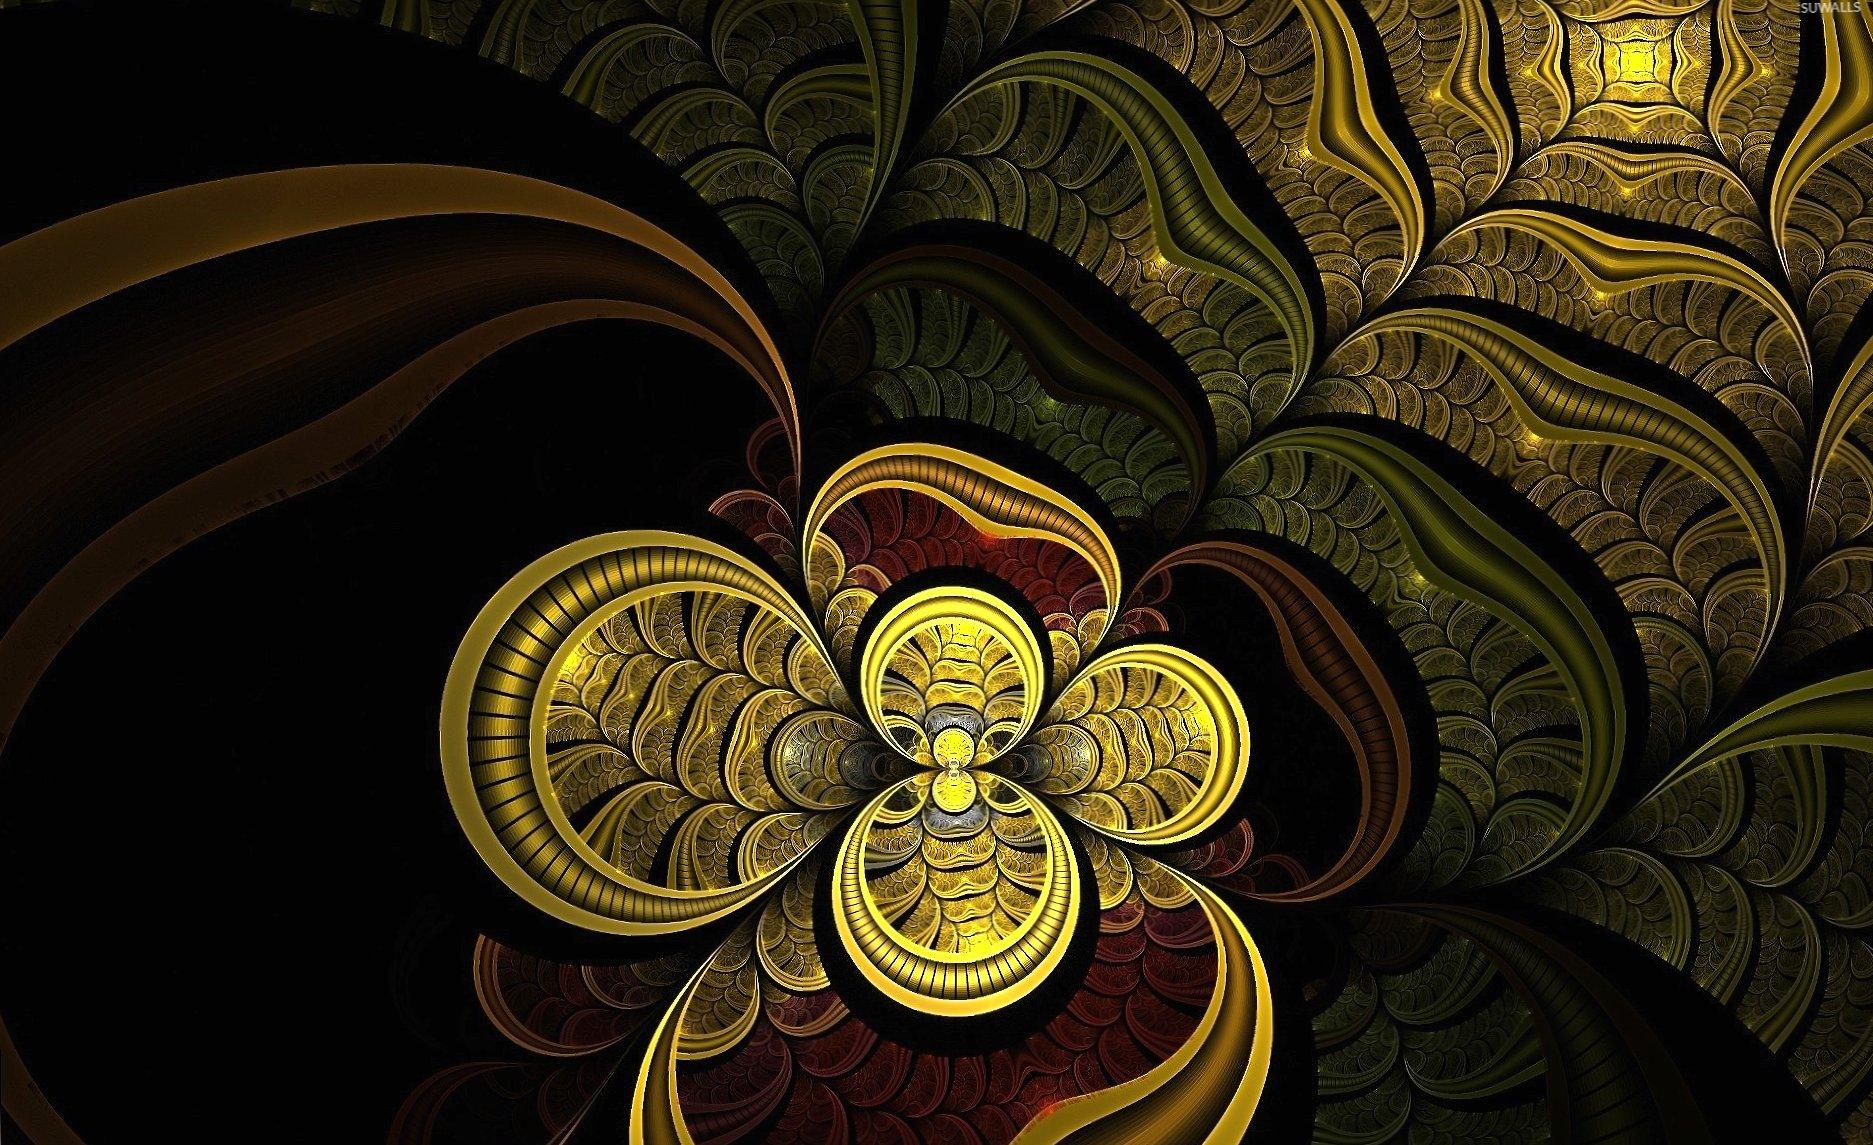 Golden flower glowing inside the swirl wallpapers HD quality